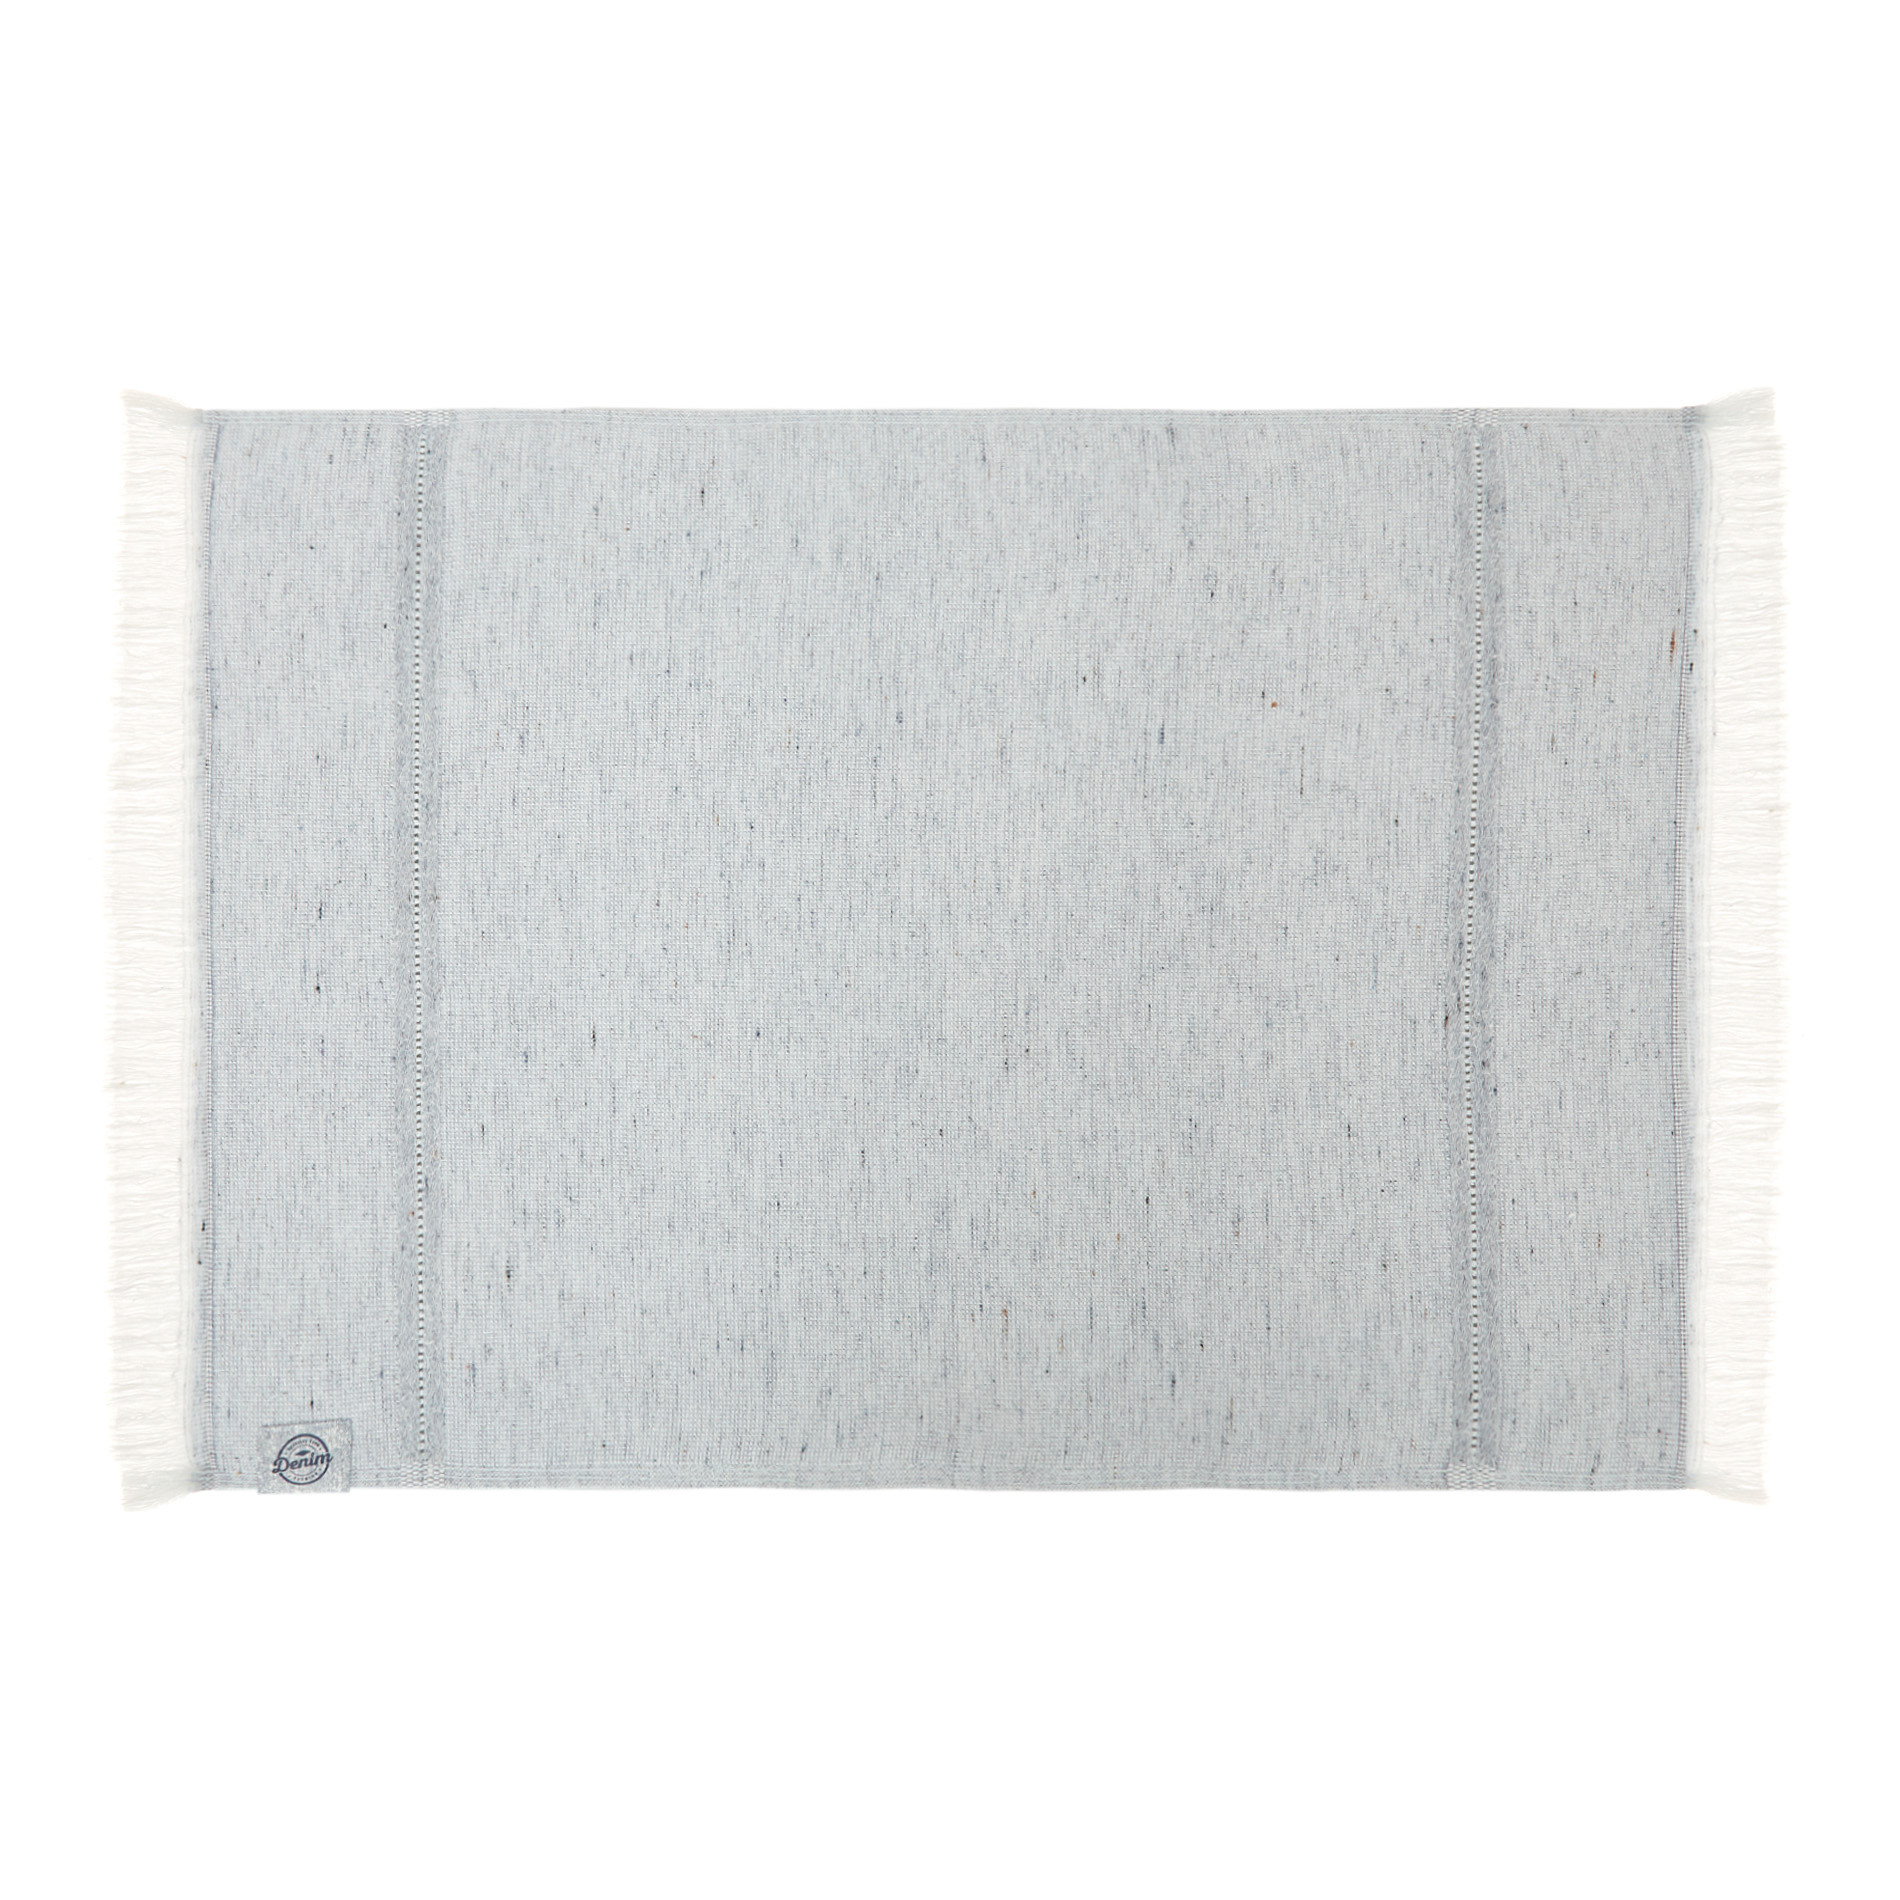 Asciugamano cotone e denim riciclato, Denim, large image number 1